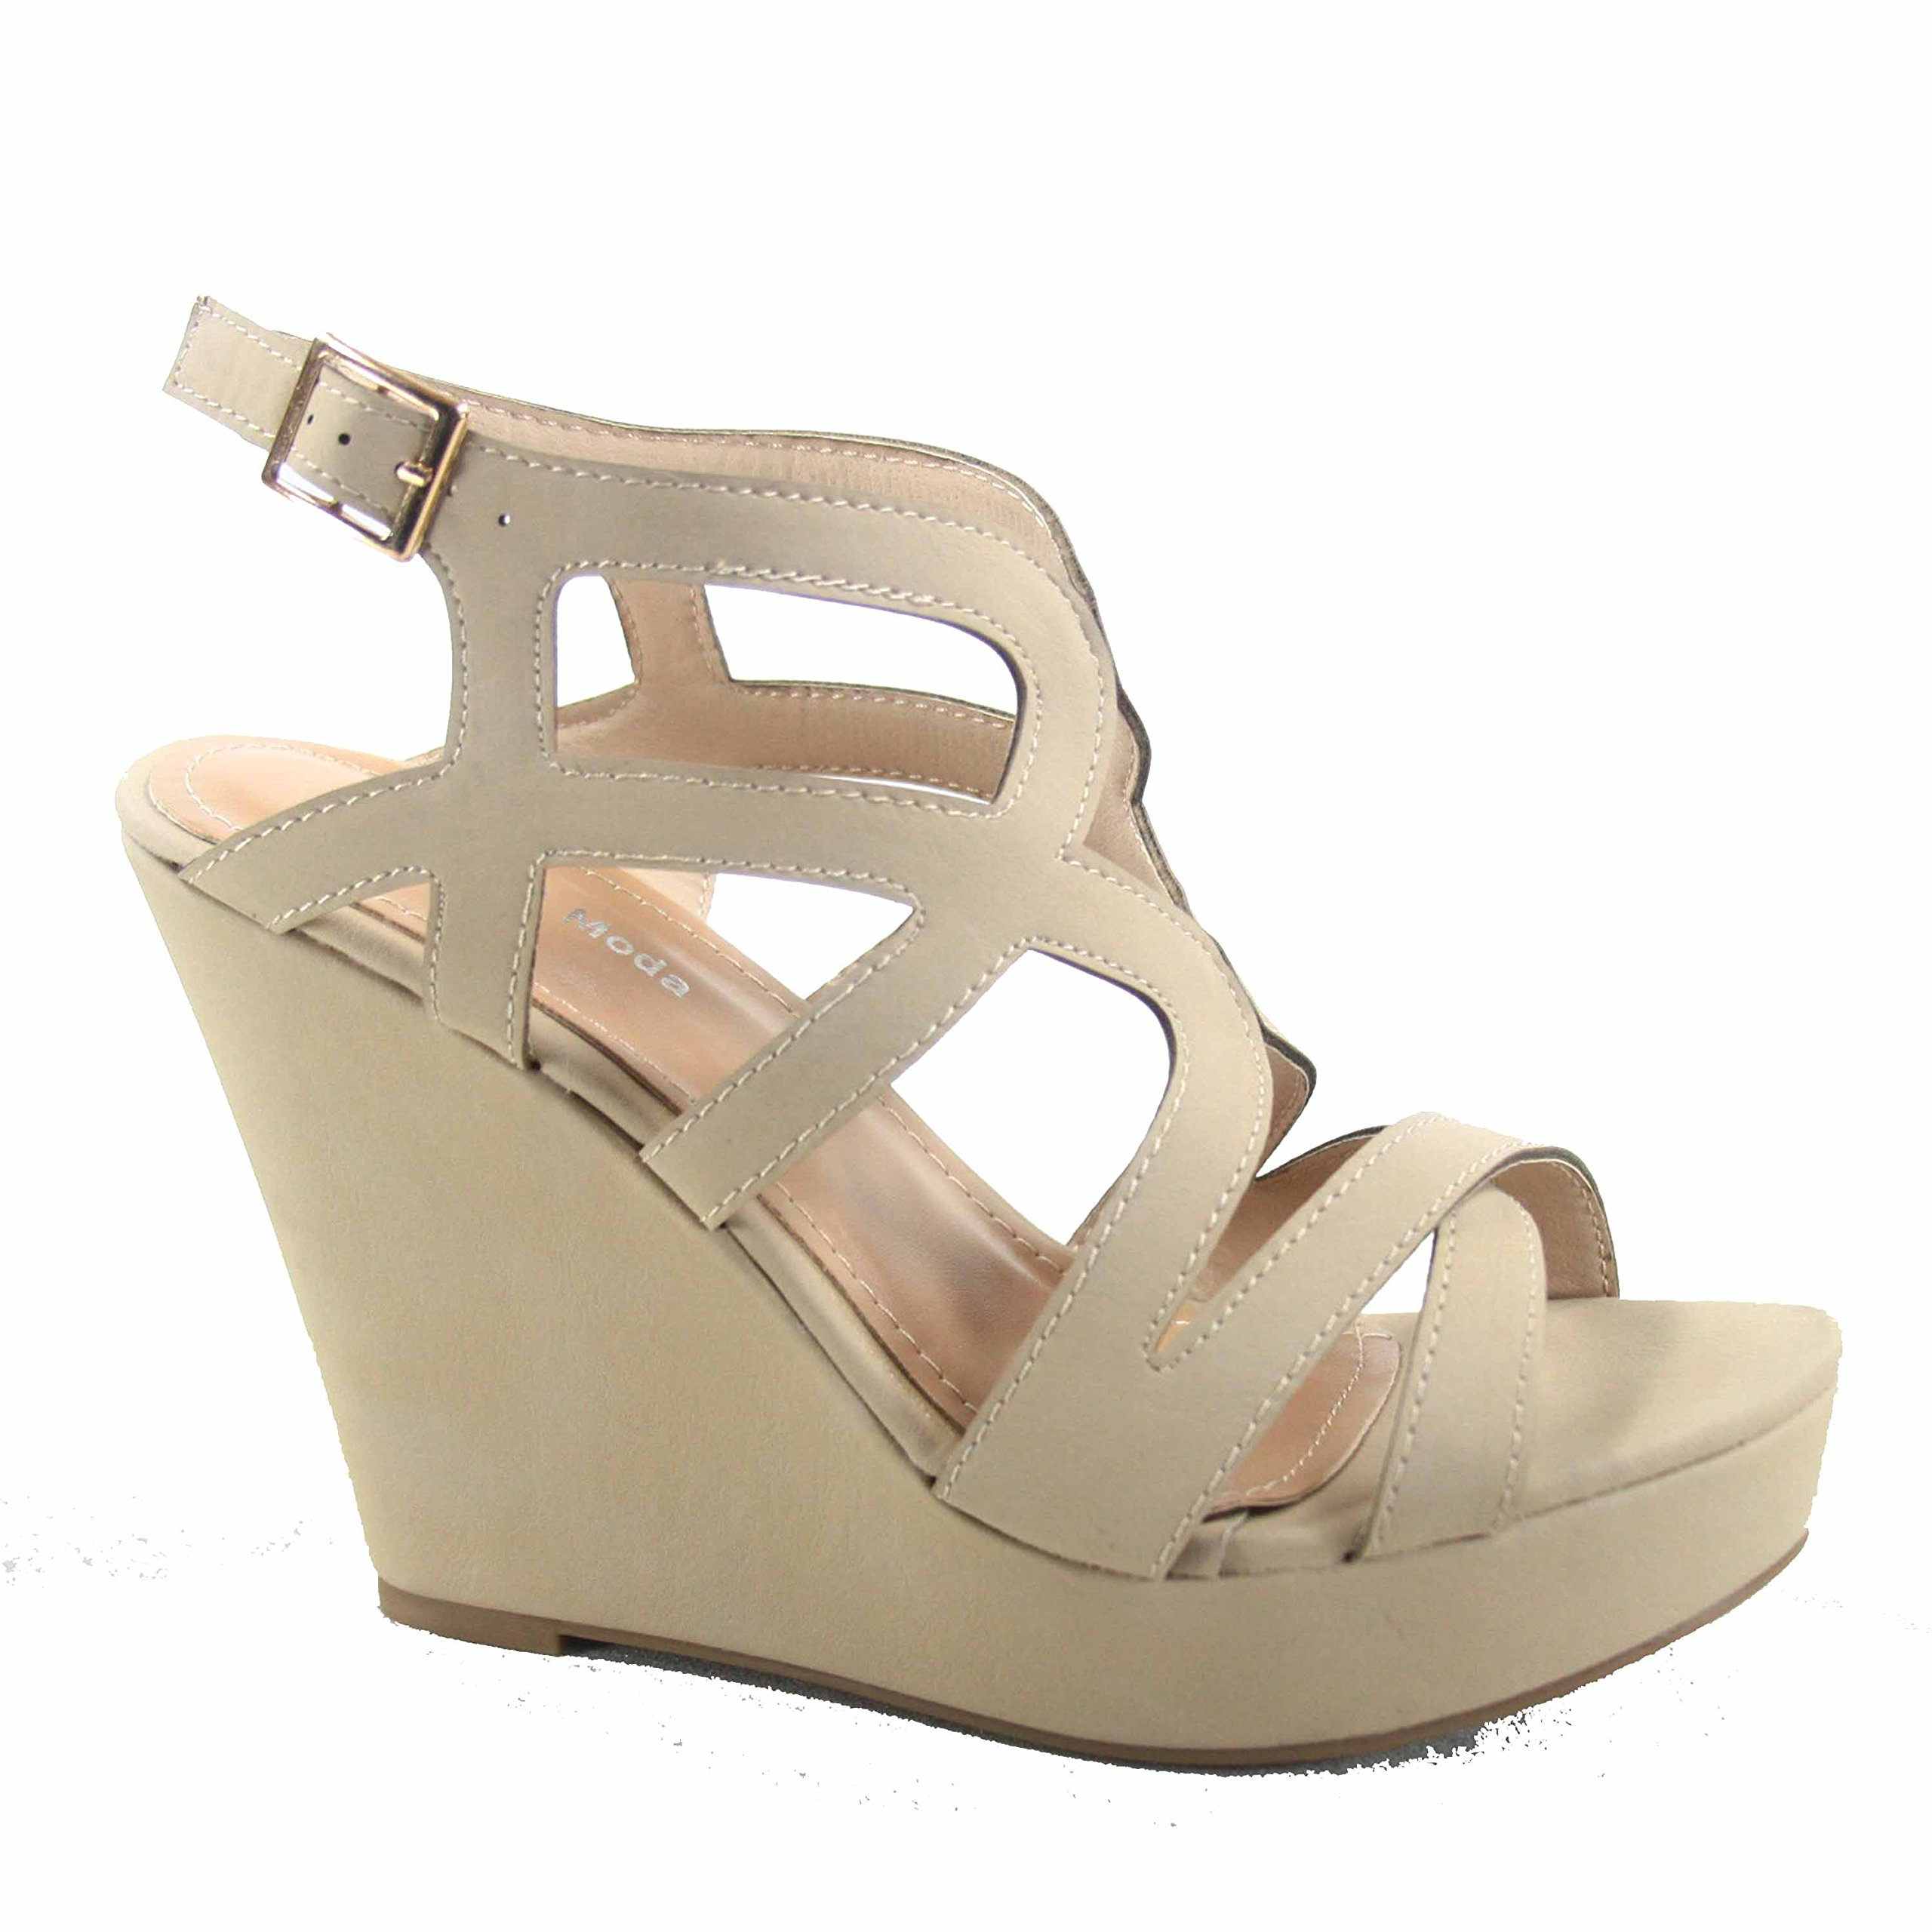 Top Moda Cathy-55 Women's Fashion Strappy Wedge Open Toe Platform Sandal Shoes (10 B(M) US, Beige)